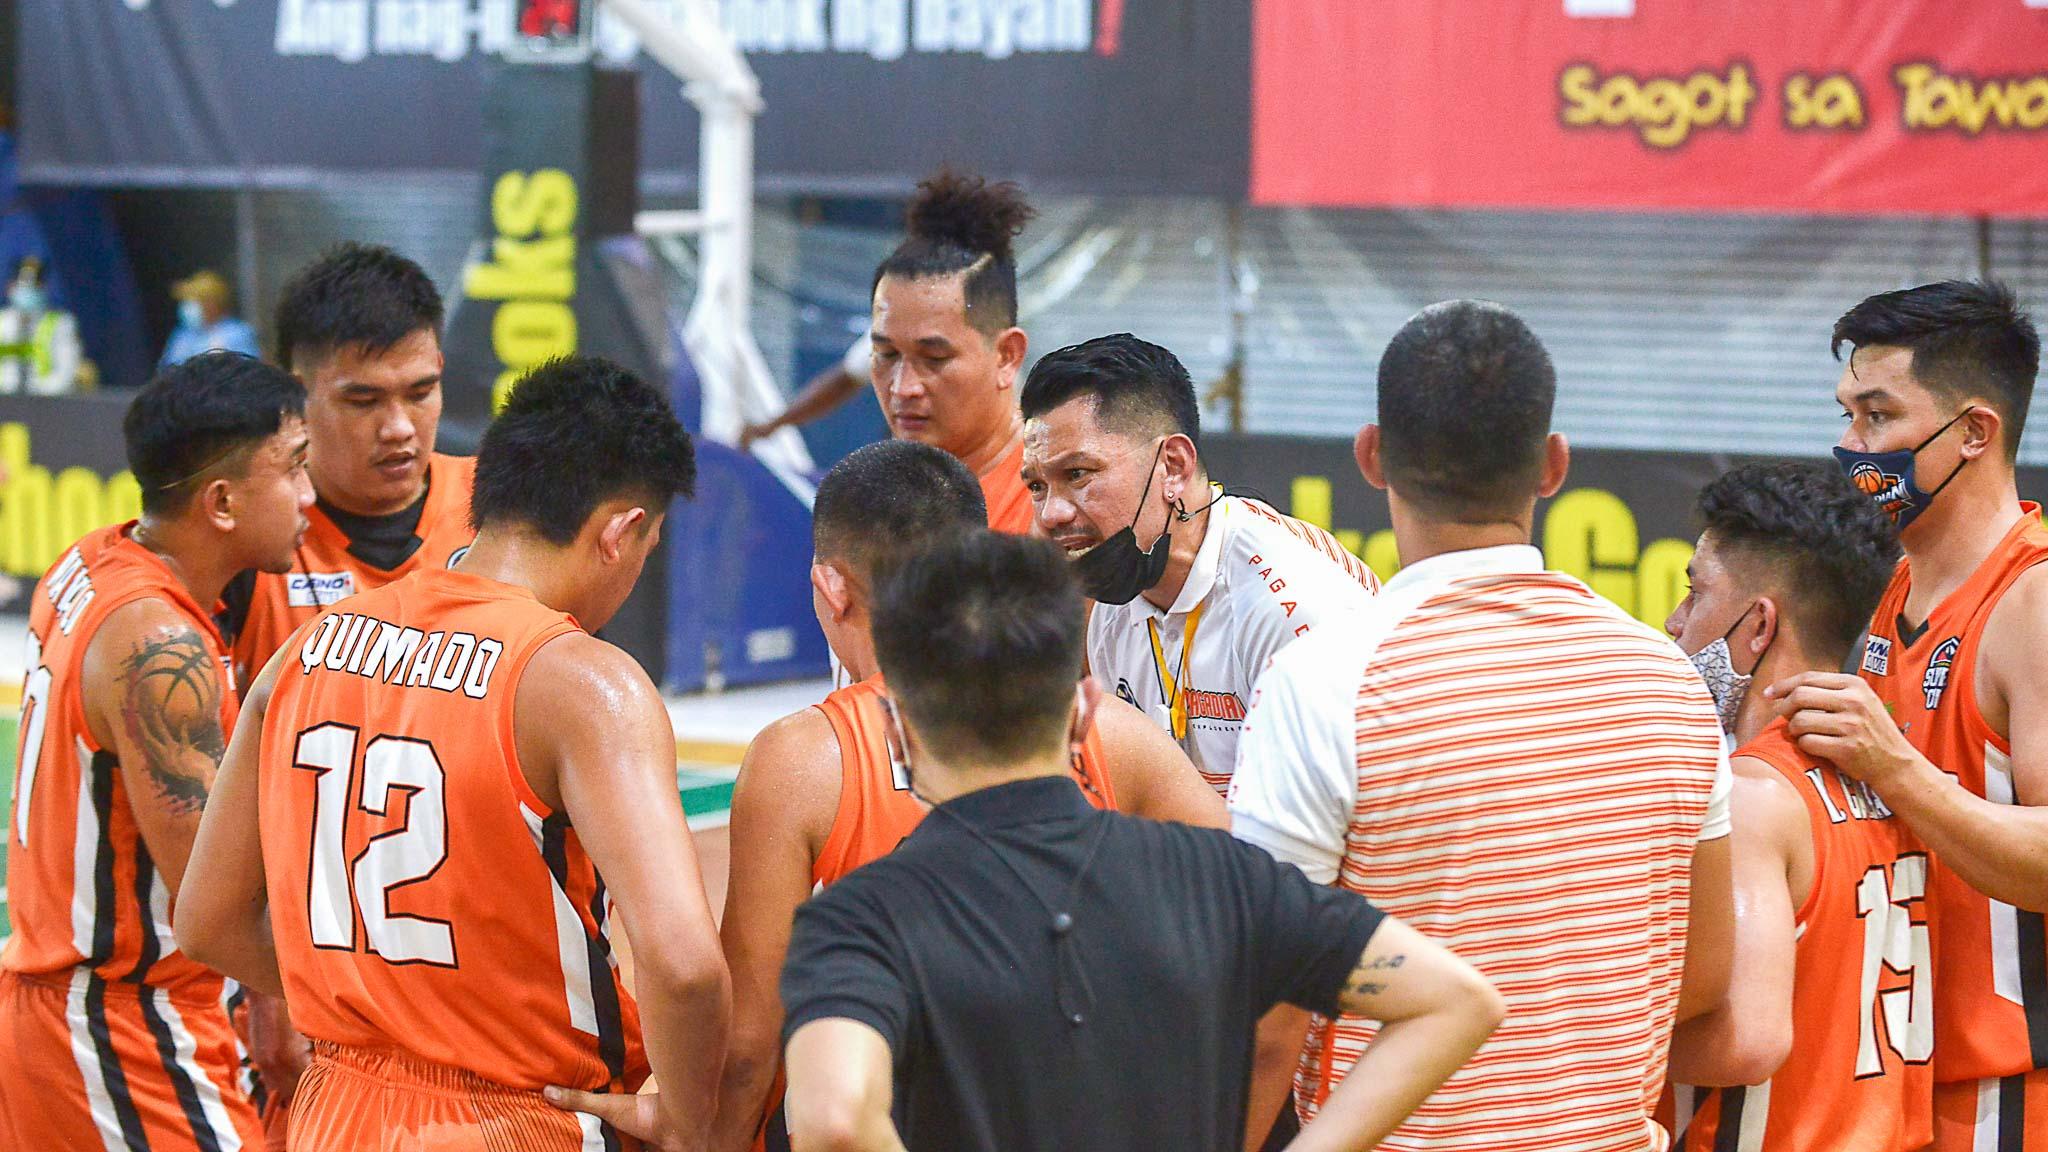 2021-Chooks-to-Go-VisMin-Roxas-vs-Pagadian-Harold-Sta-Cruz Dechos winner proves that Pagadian can match 'import'-laden VisMin field Basketball News VisMin Super Cup  - philippine sports news